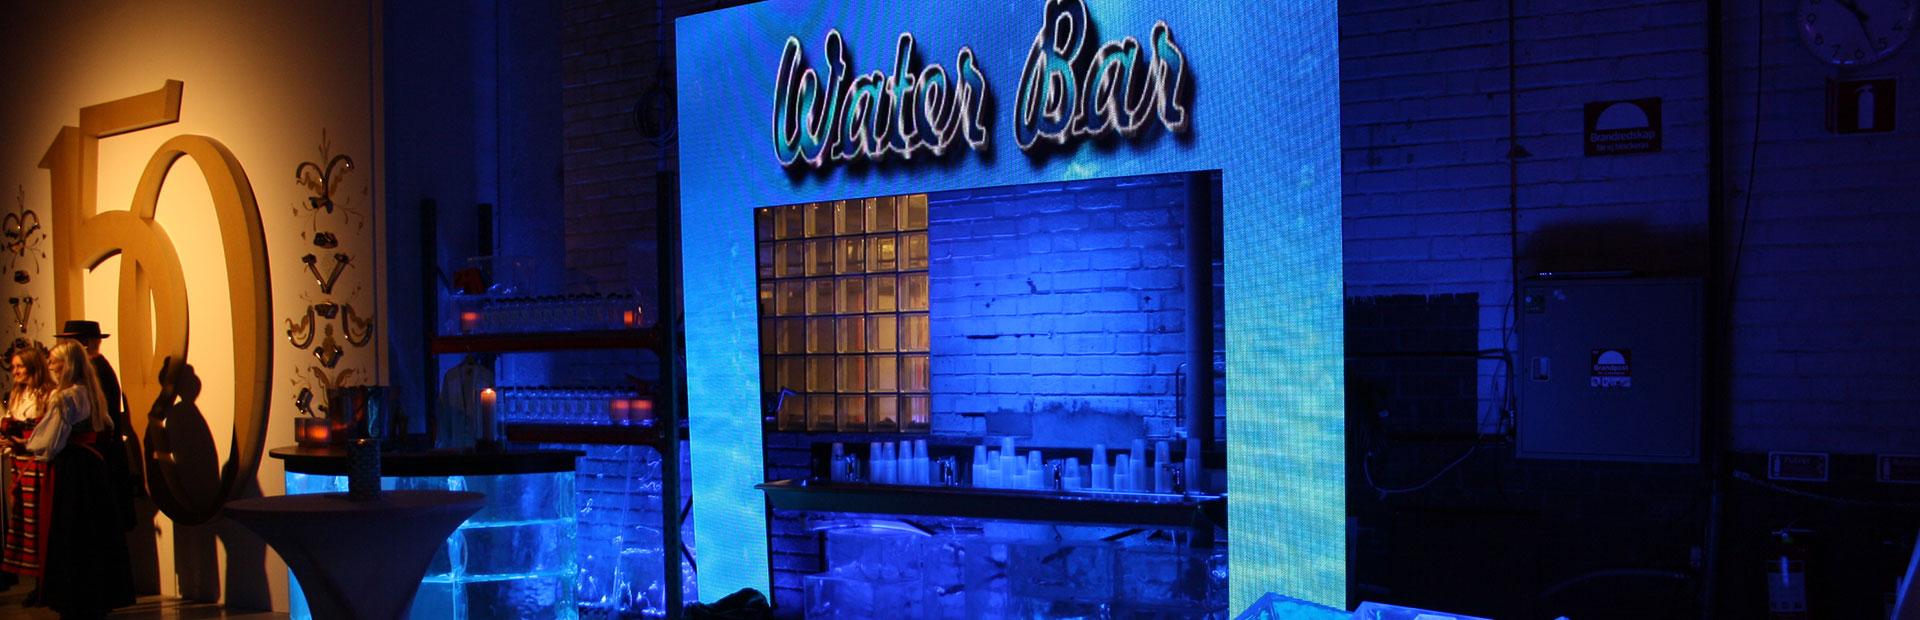 BG_Waterbar_revslider